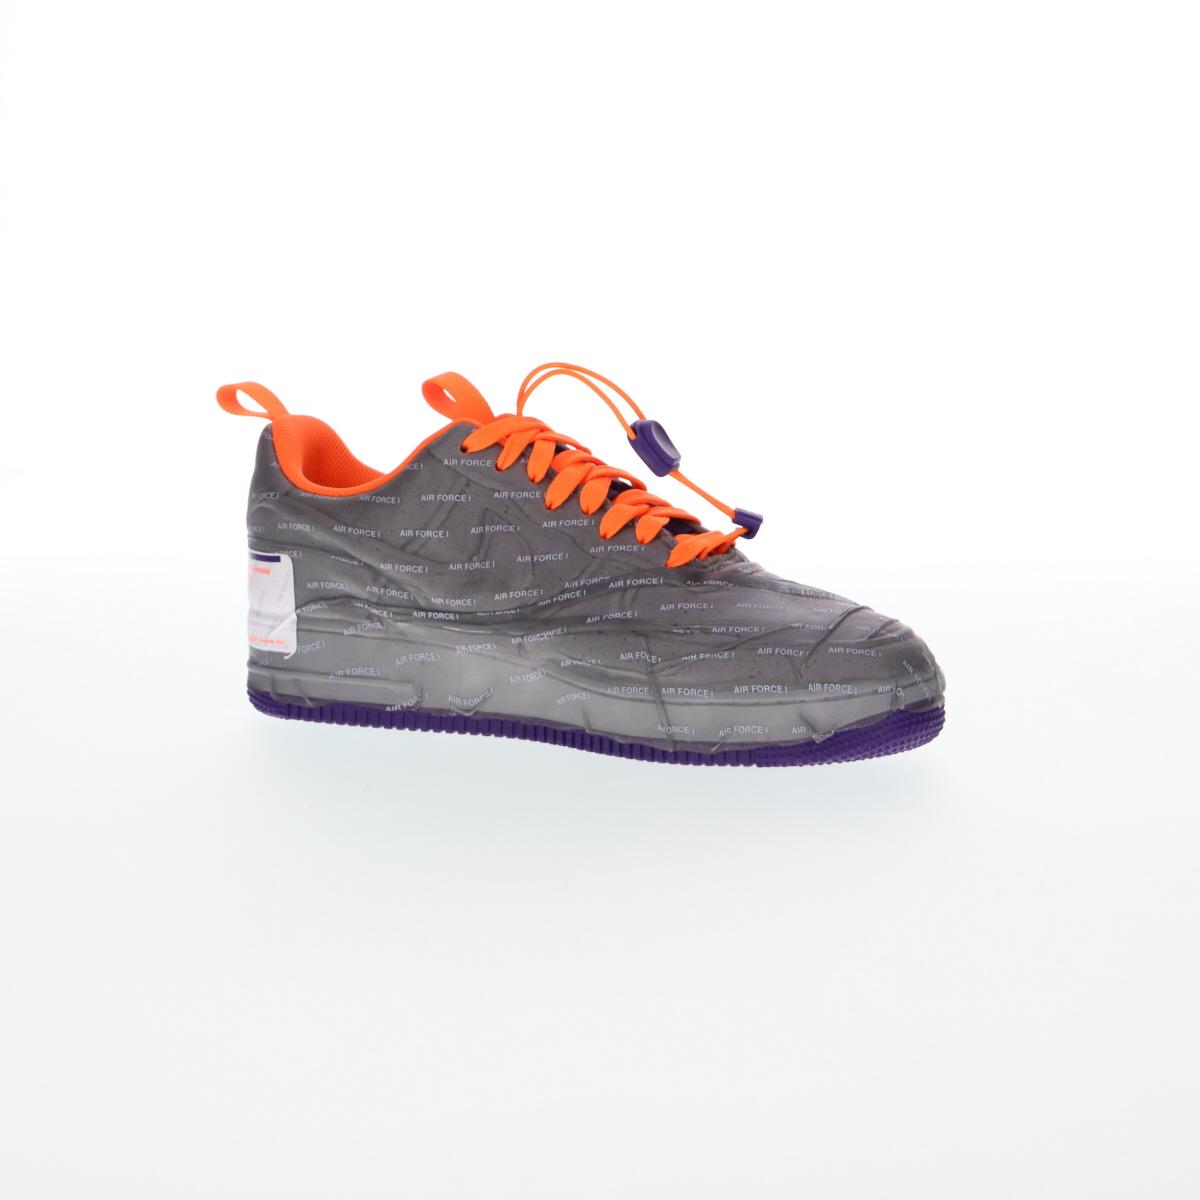 nike air max 1 ultra moire grey women sale online